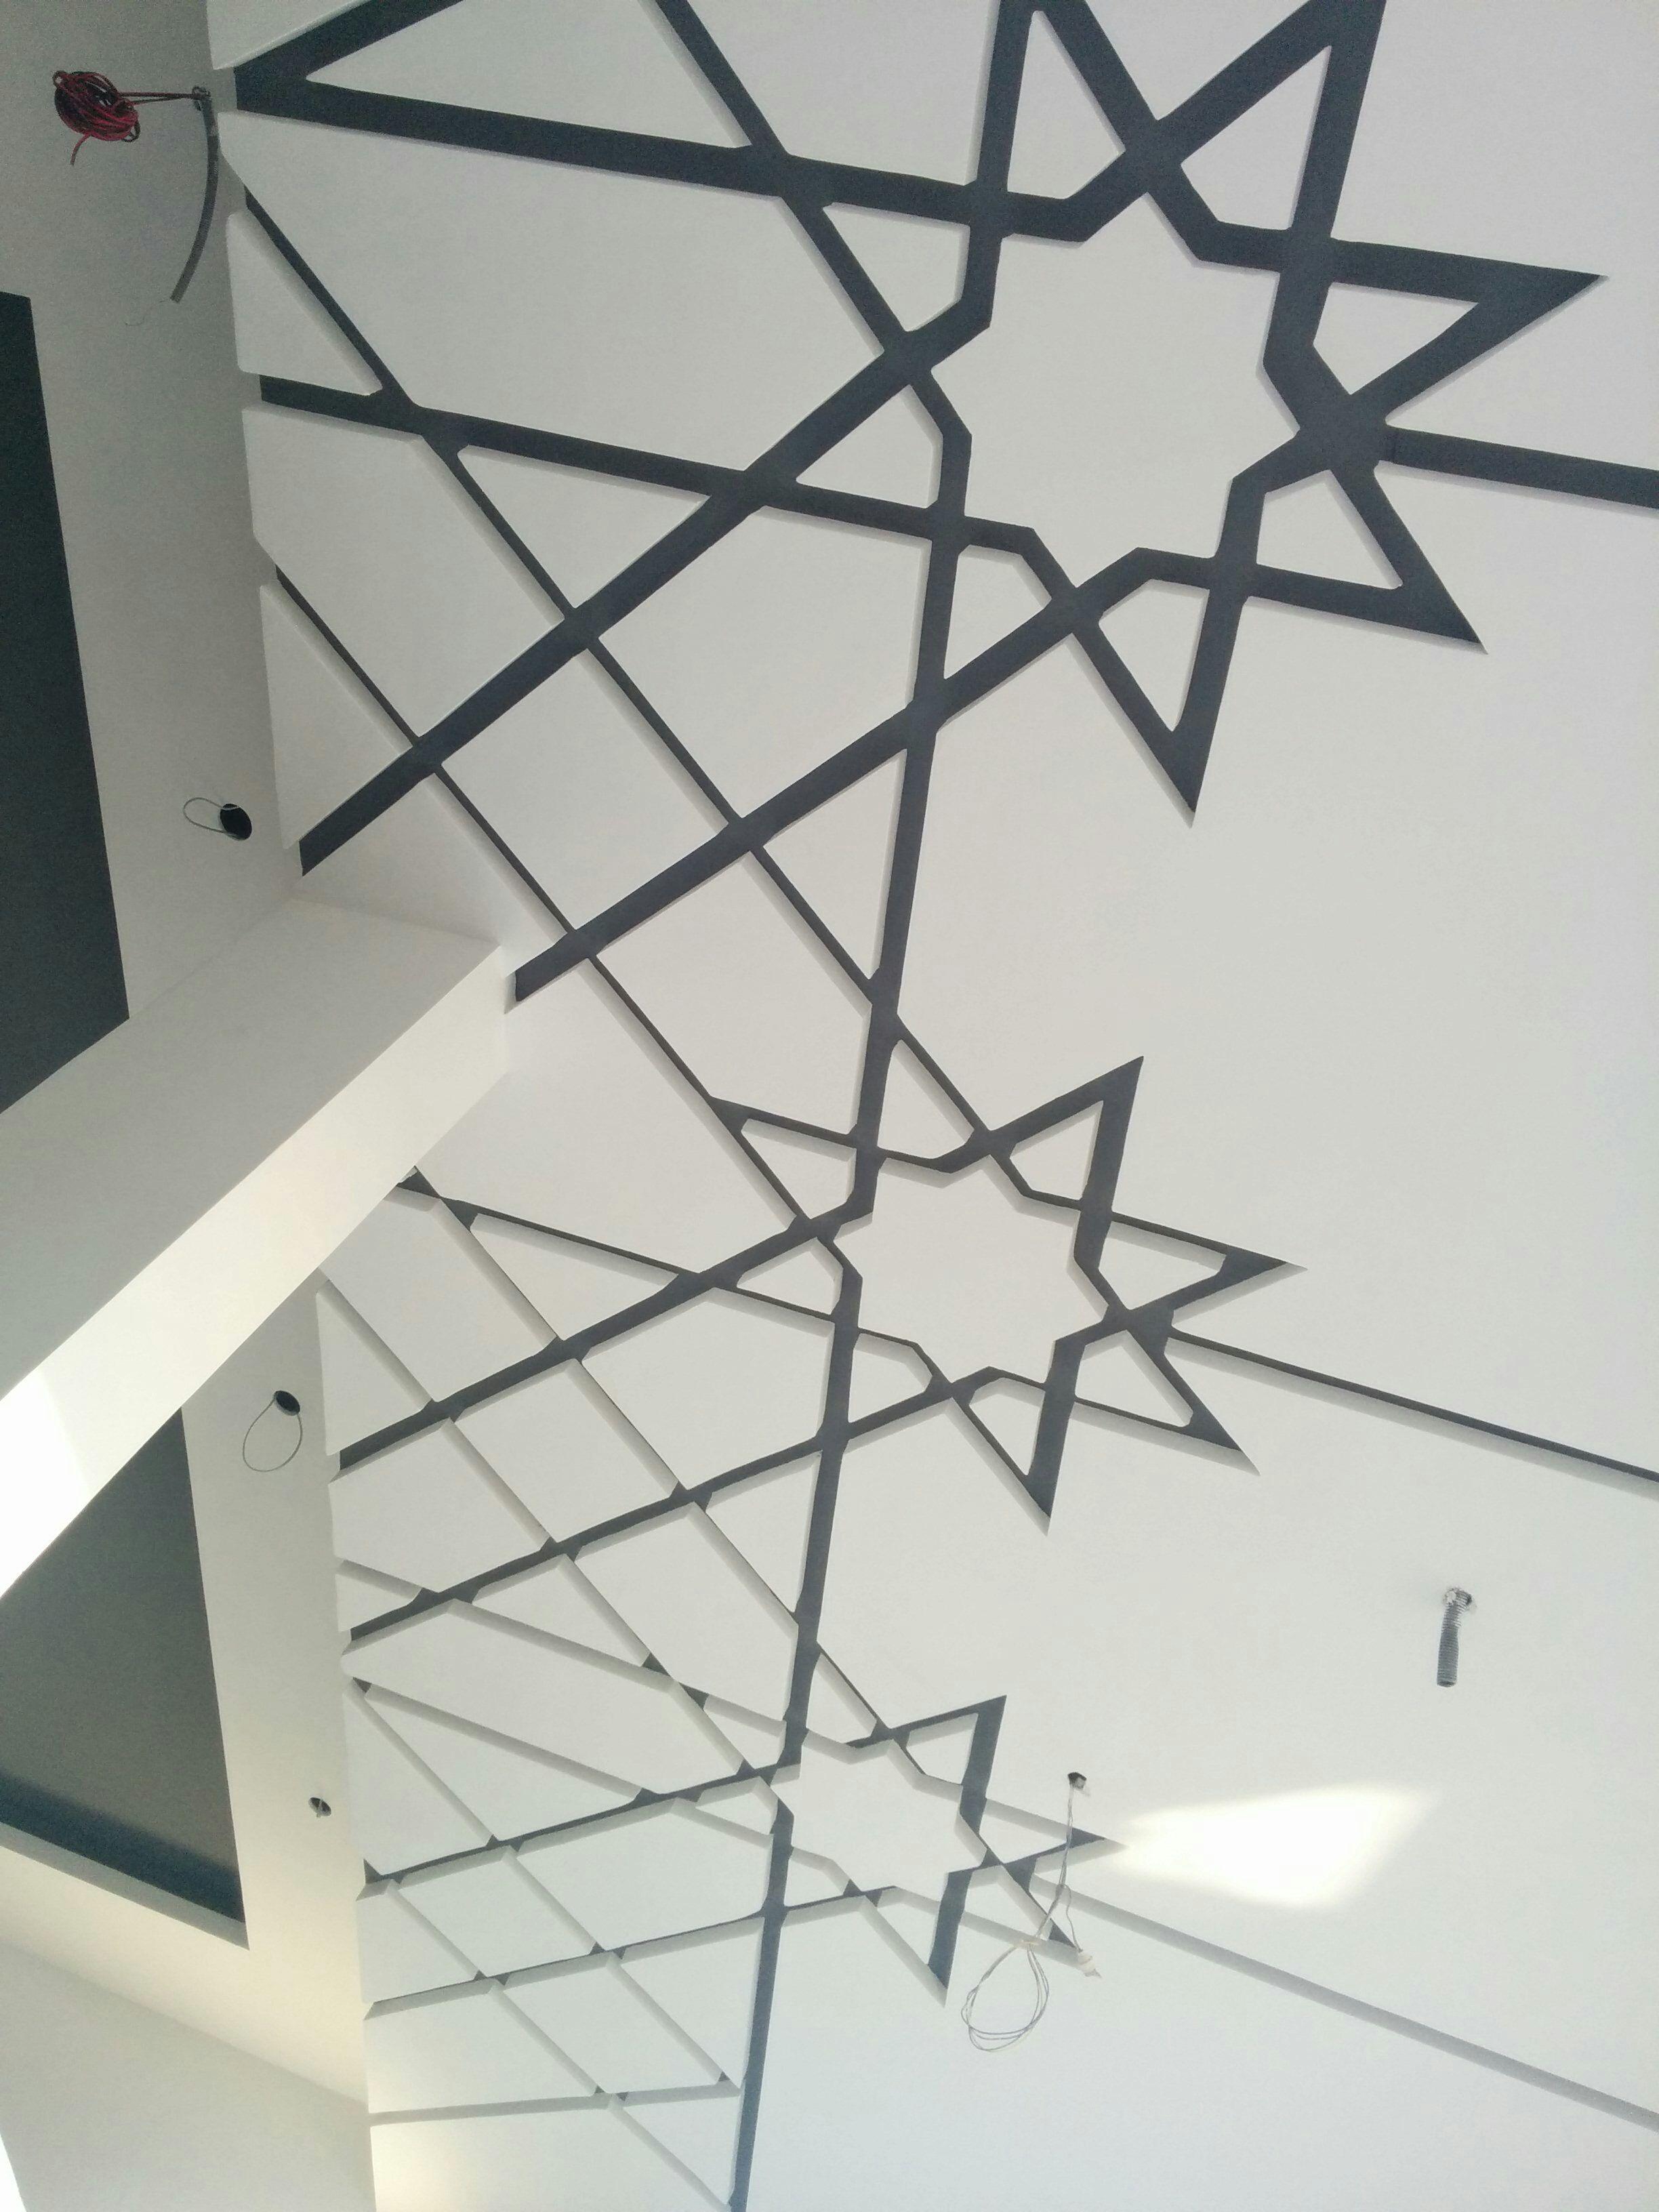 Islamic Pattern ceiling | ART PLATRE | Pinterest | Ceiling ...